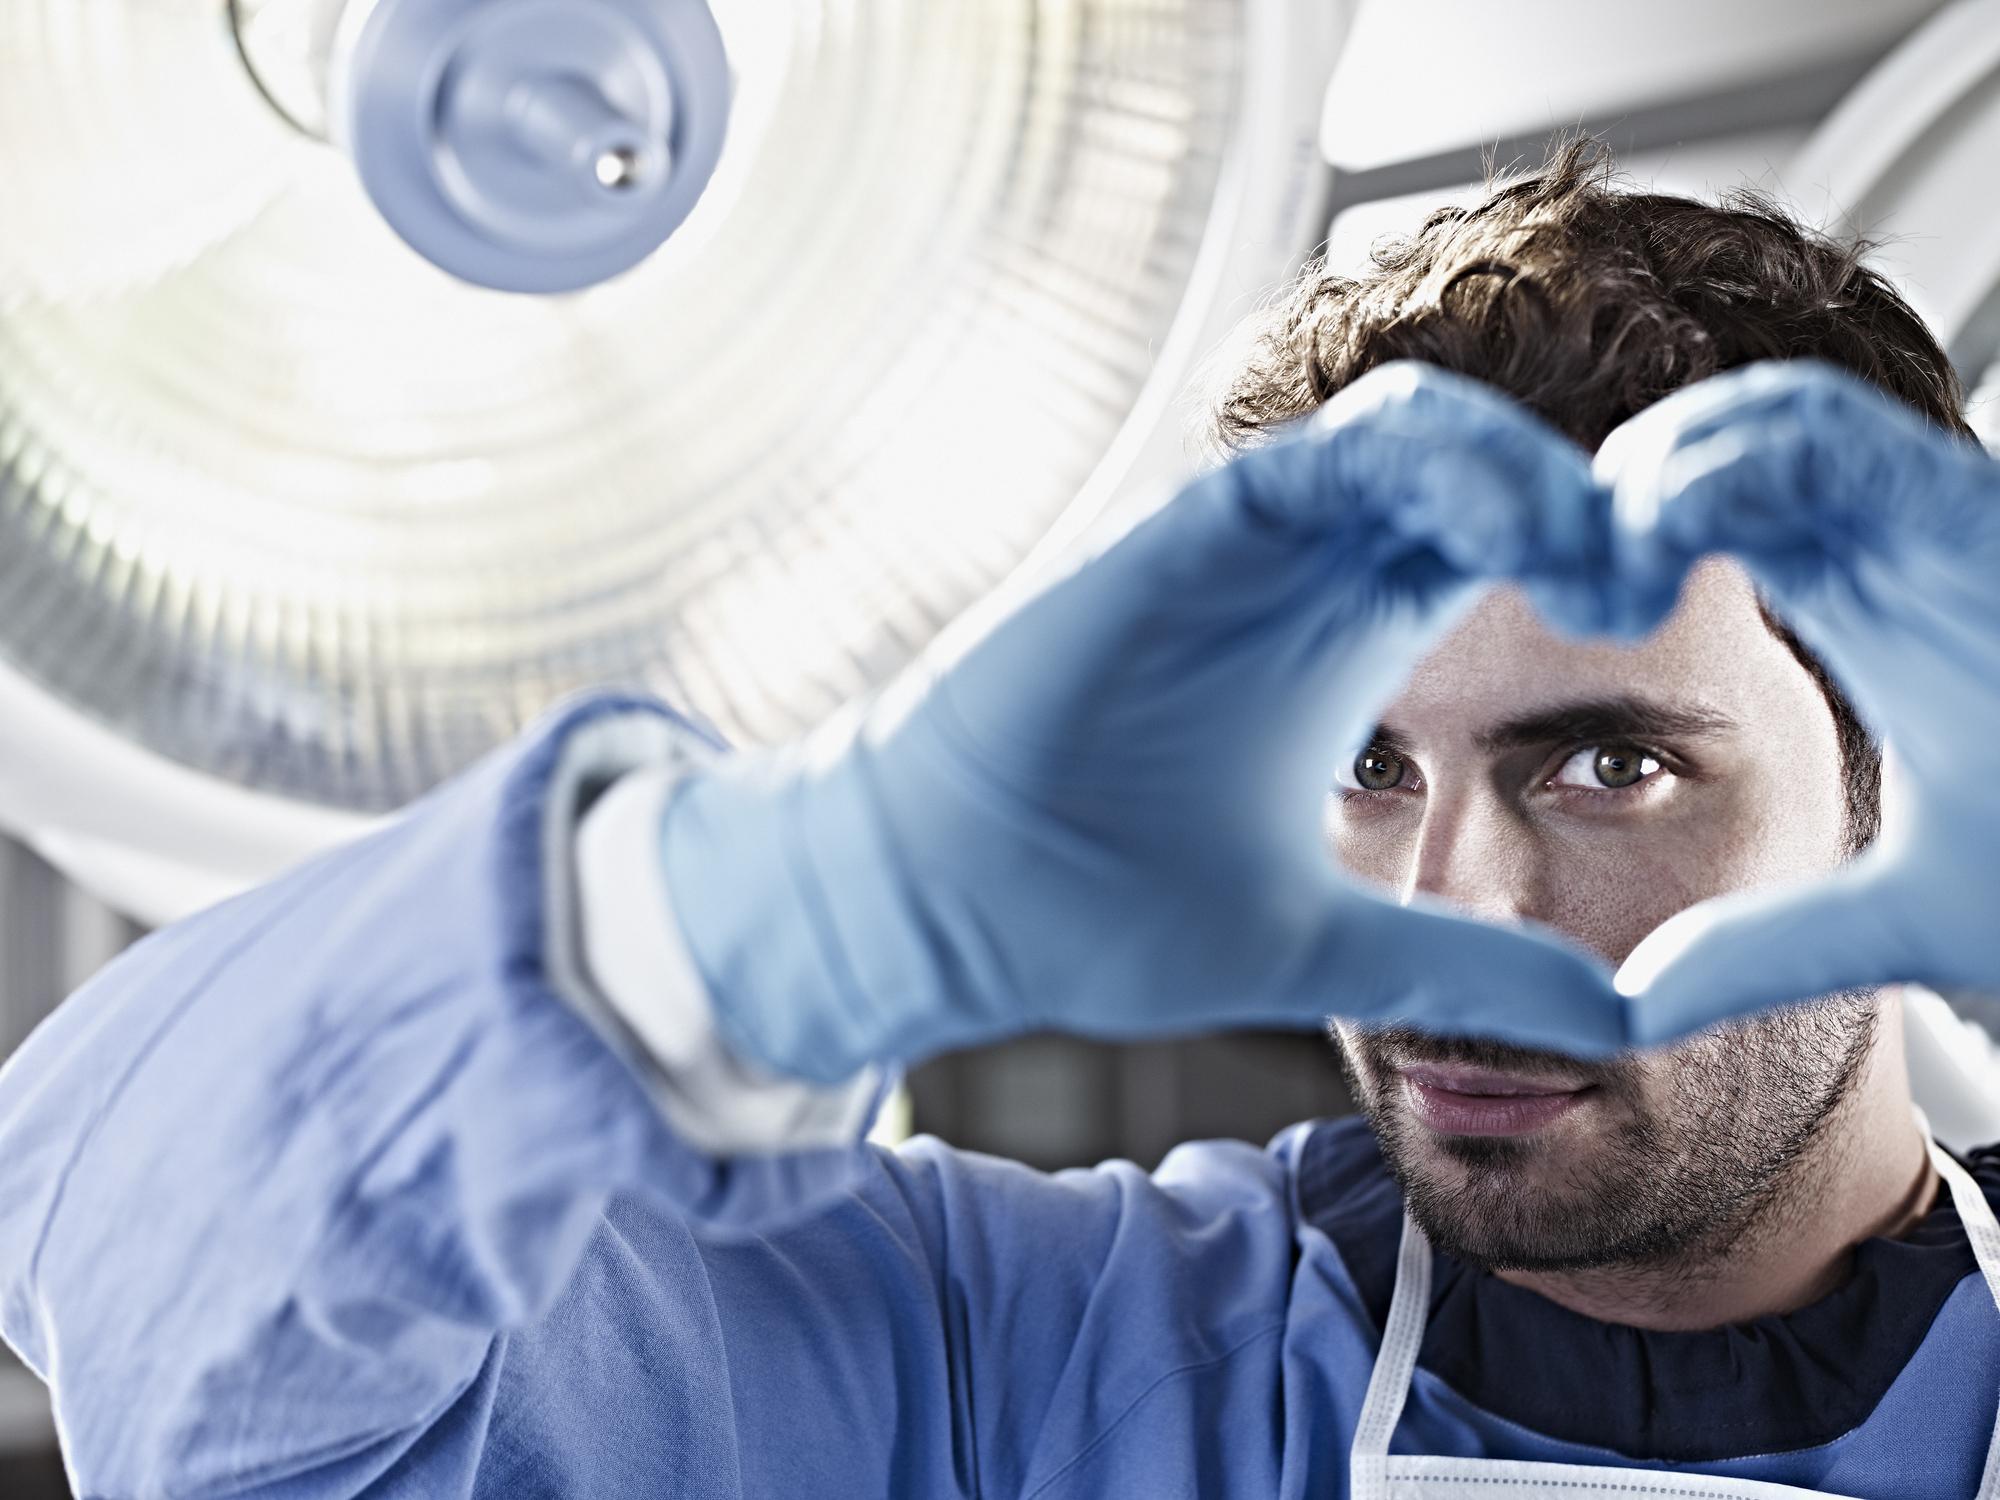 This heart valve procedure is an alternative to open heart surgery